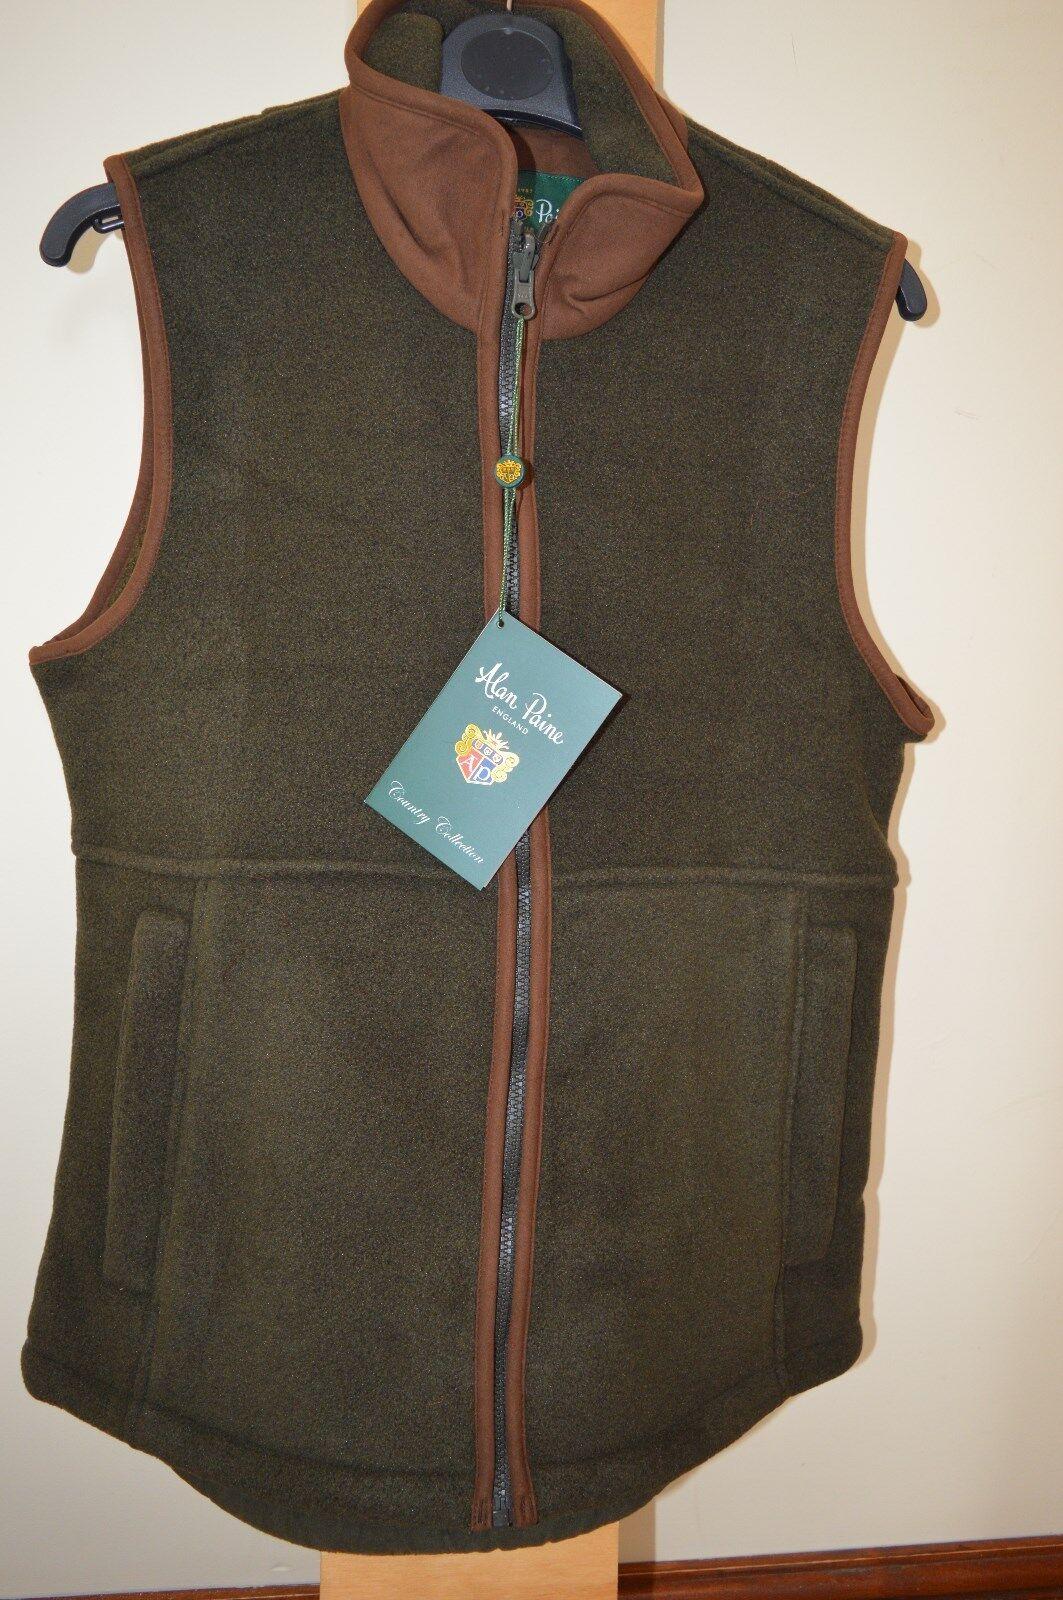 Alan Paine Ladies Aylsham Fleece Waistcoat Green Size 14. 36